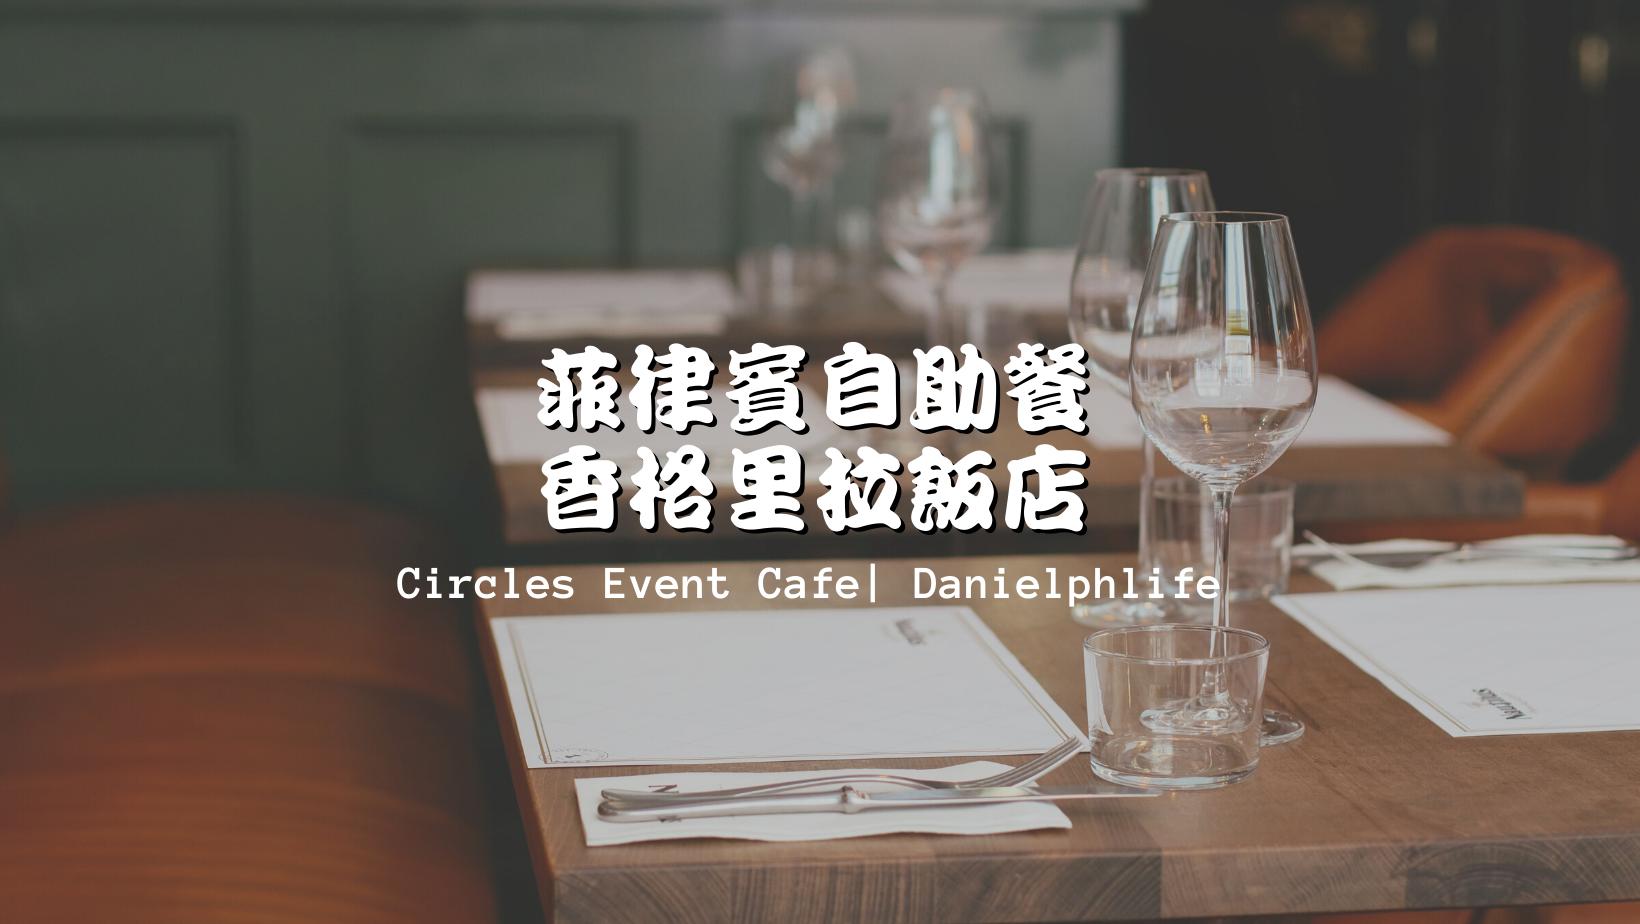 Circles Event Cafe